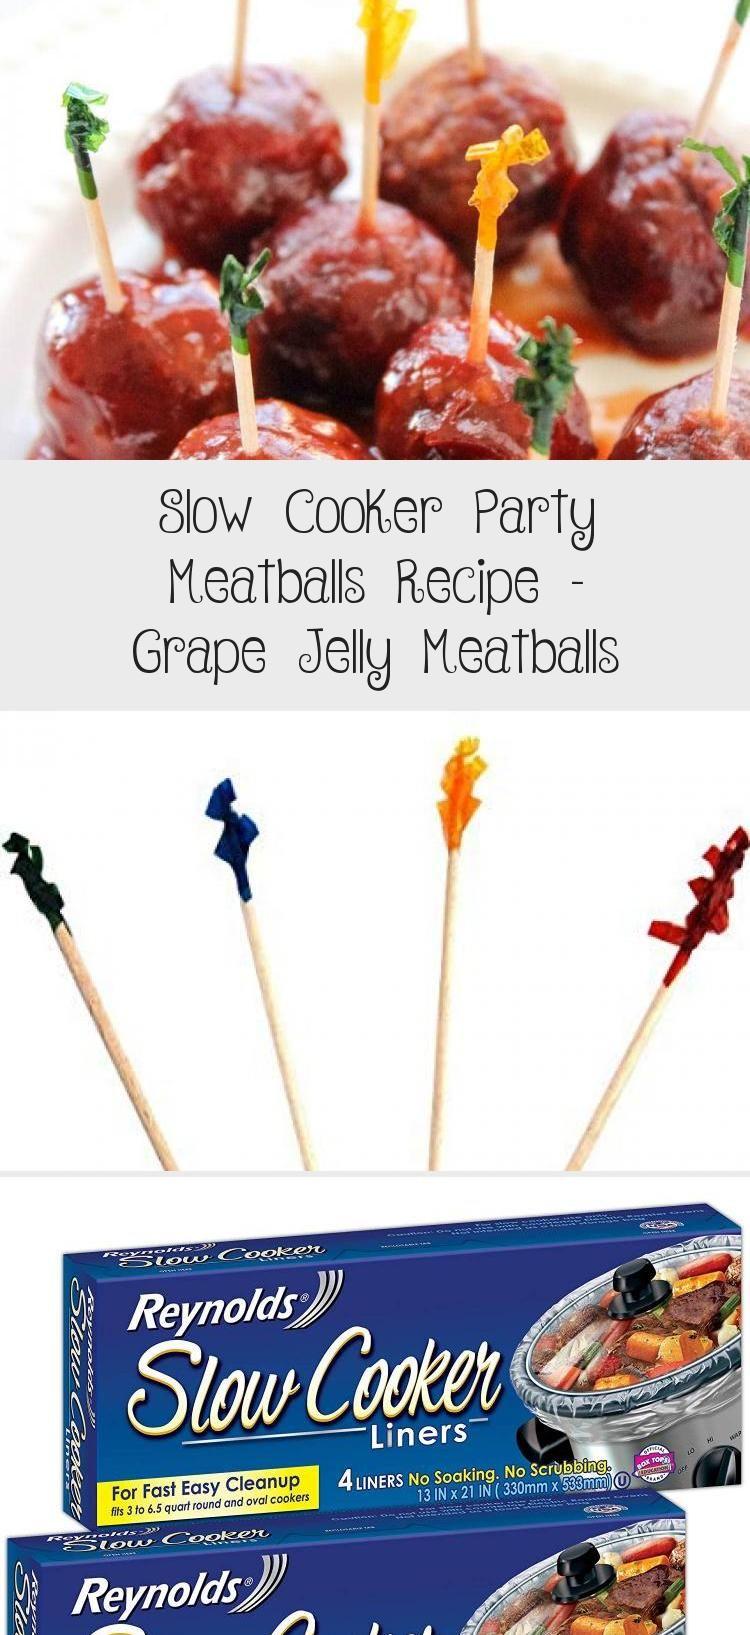 Slow Cooker Party Meatballs Recipe AKA Grape Jelly Meatballs via @mommymusings #FoodandDrinkParty #meatballswithgrapejelly